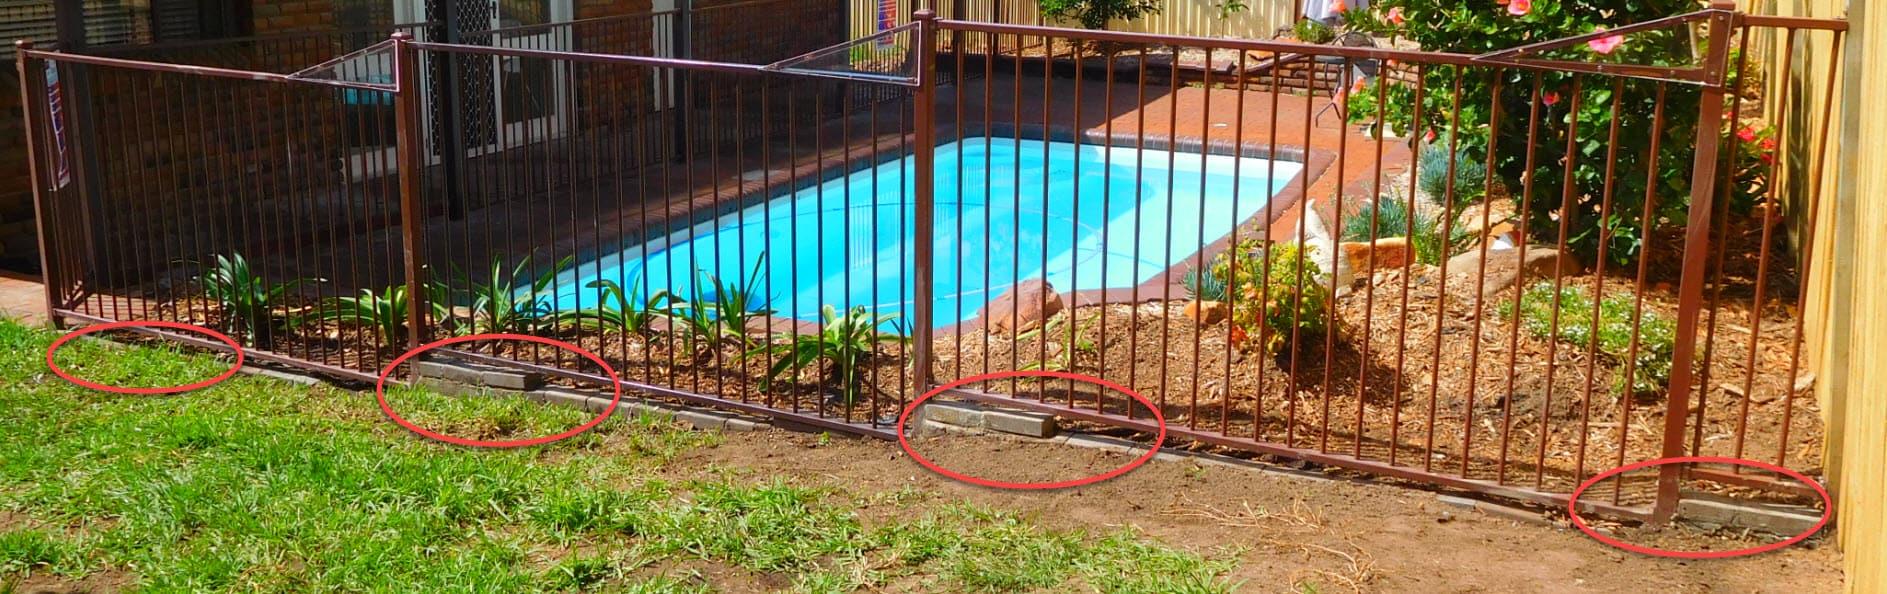 Pool certification sydney pool certify pool certification sydney 1betcityfo Images